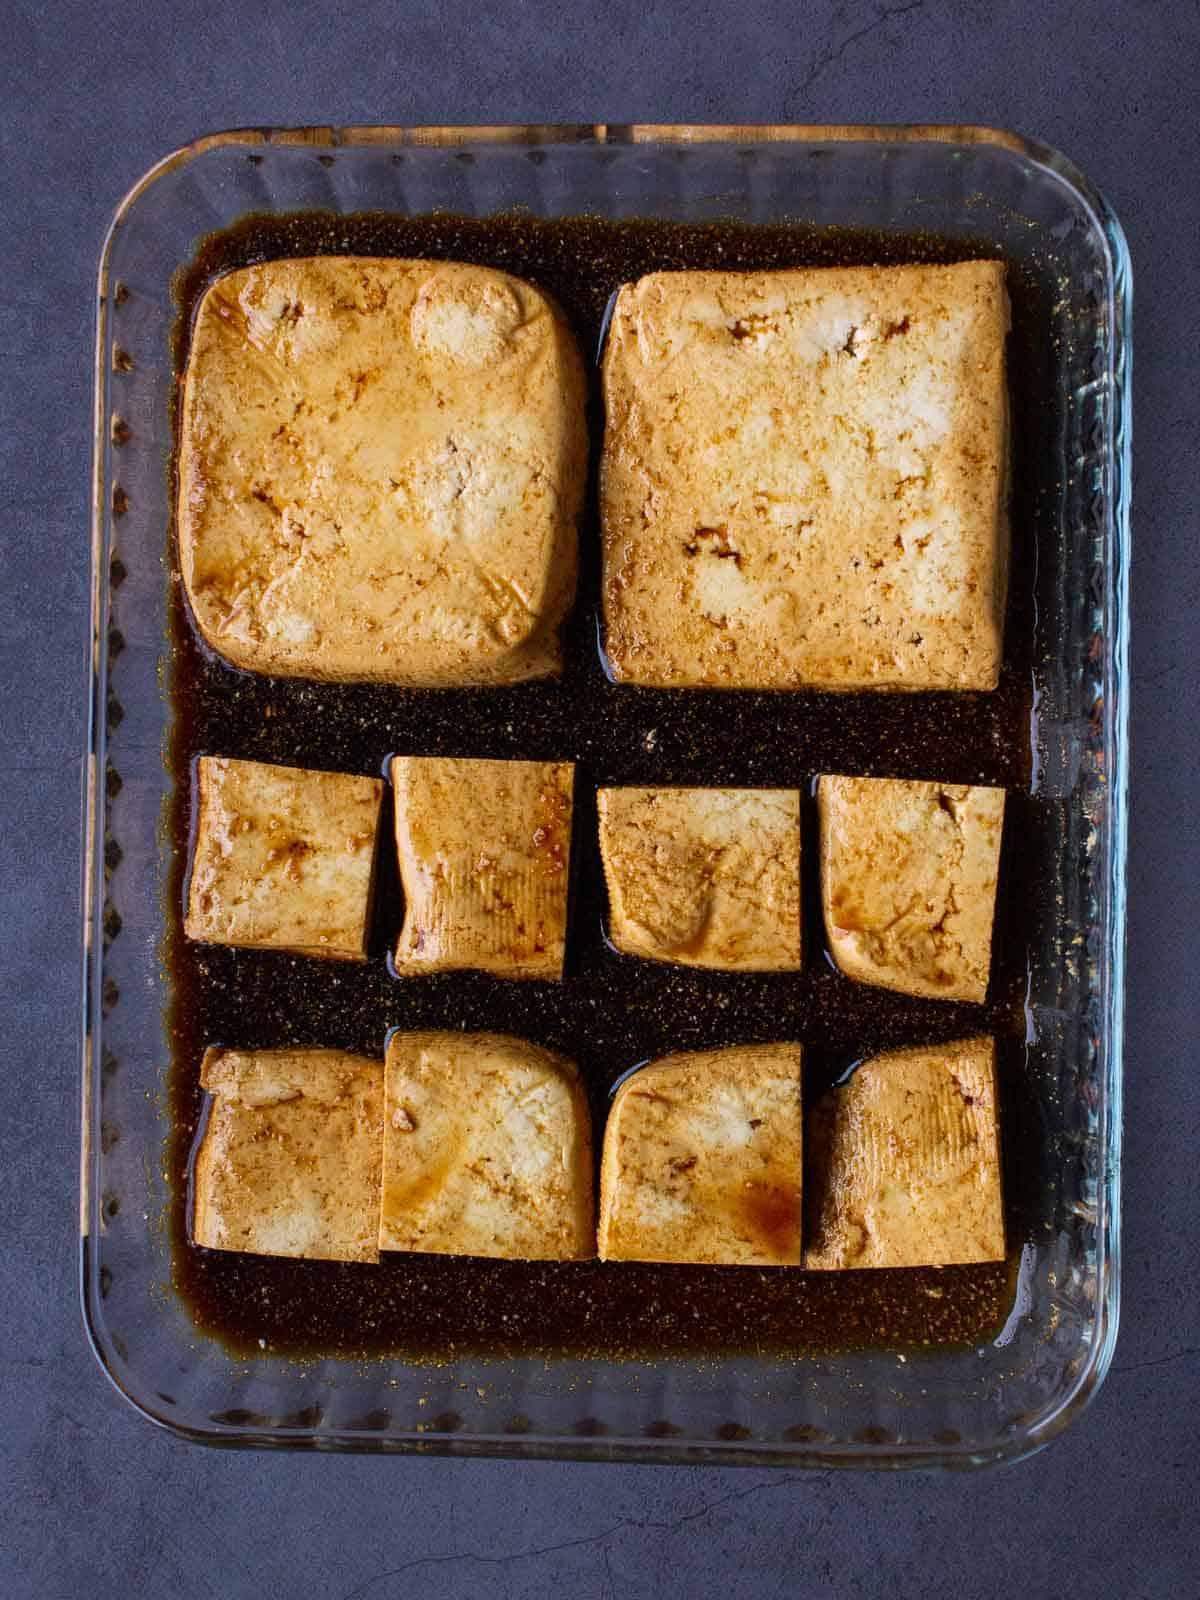 marinating extra firm tofu